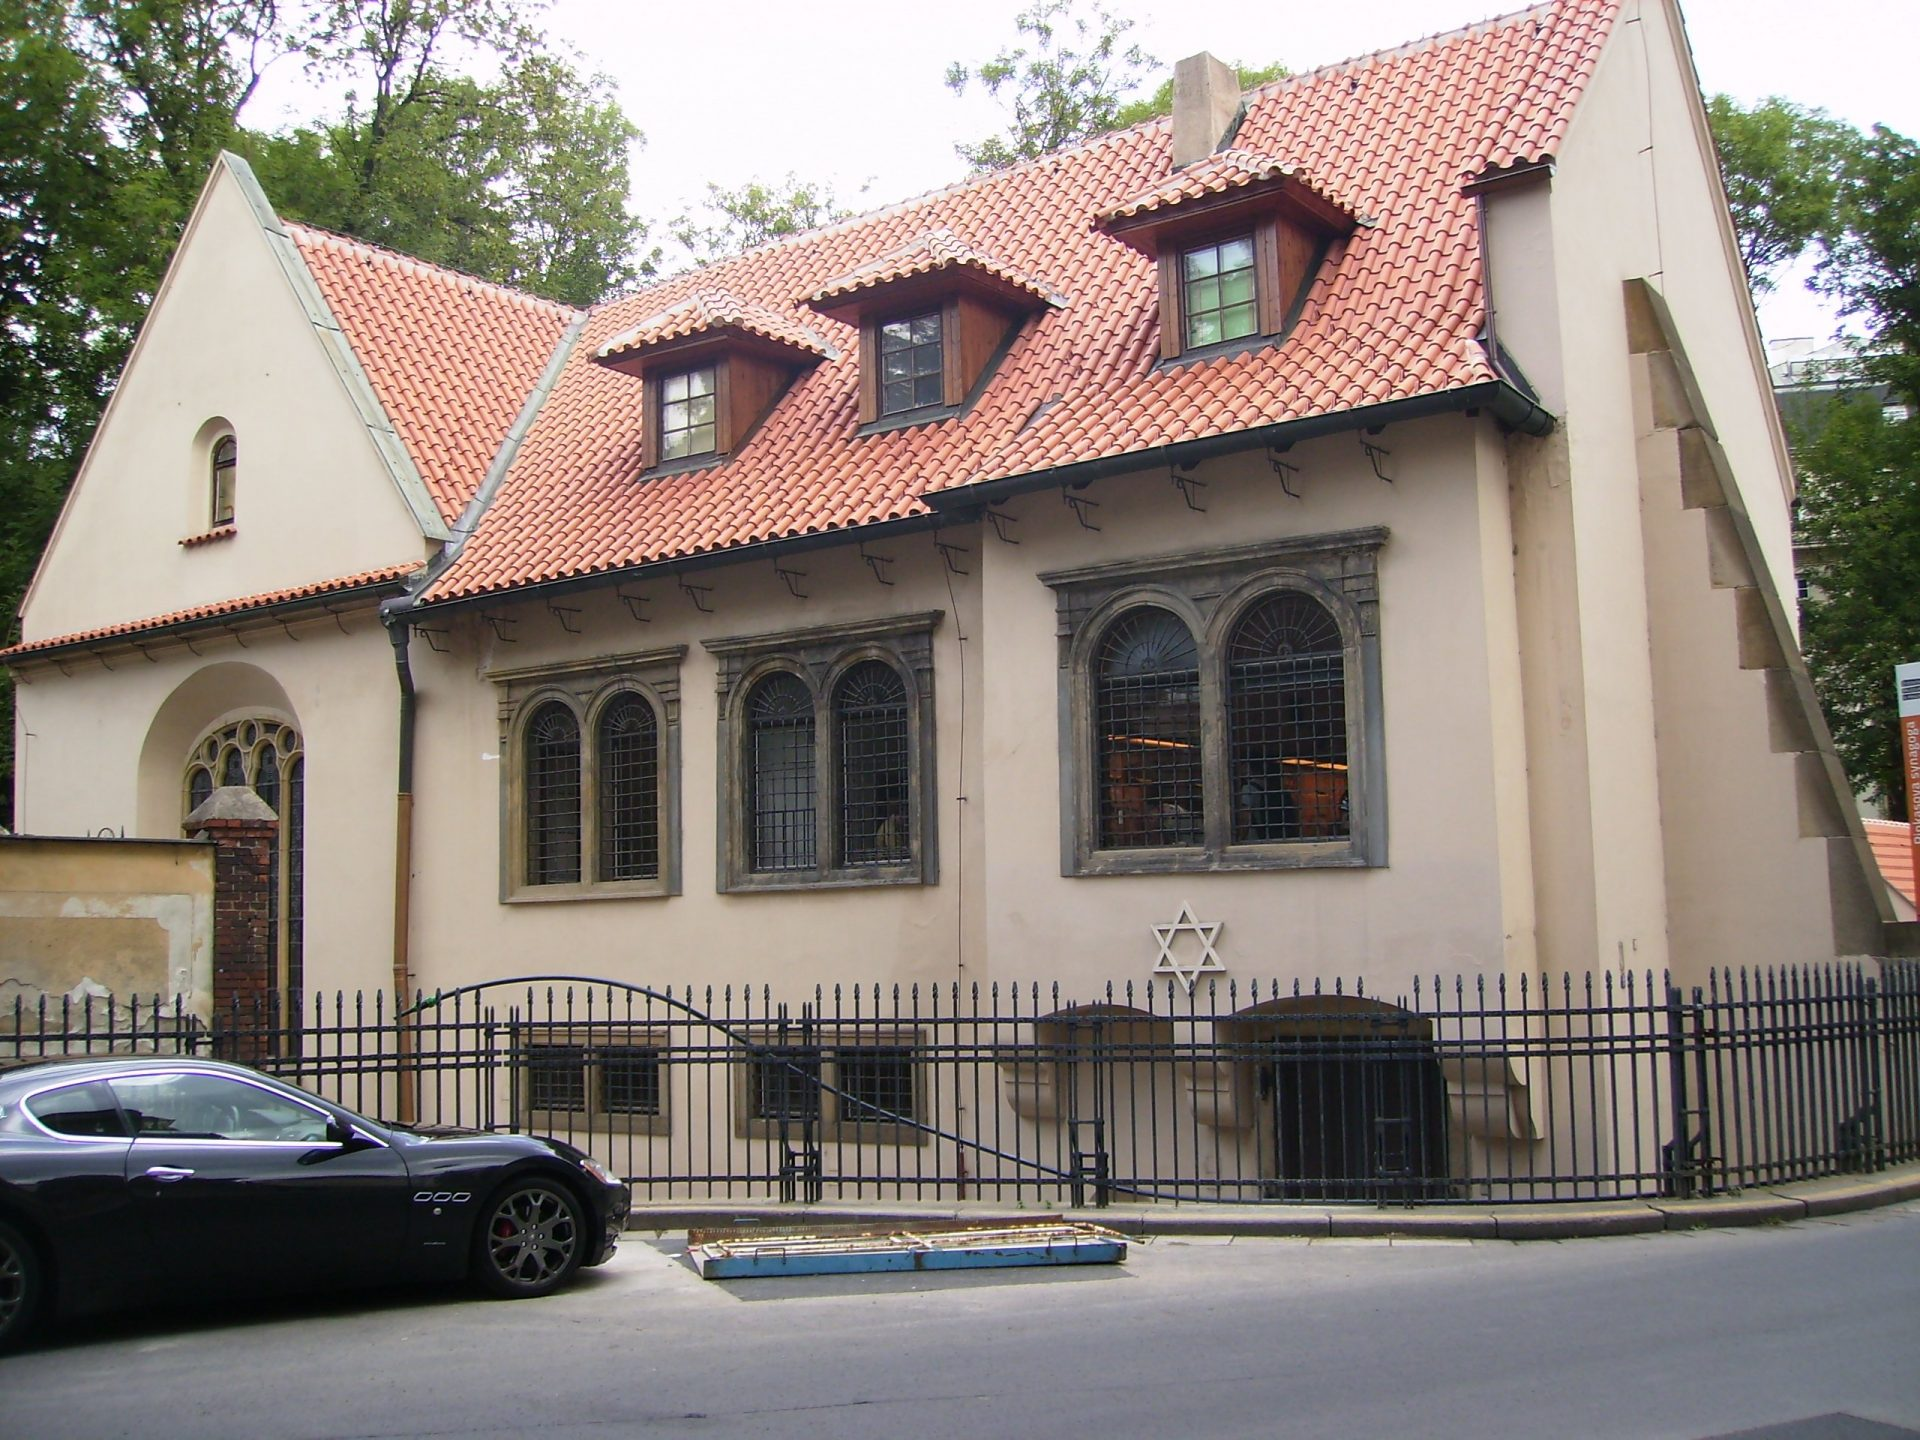 Пинкасова синагога, Прага, Чехия. Июль, 2011